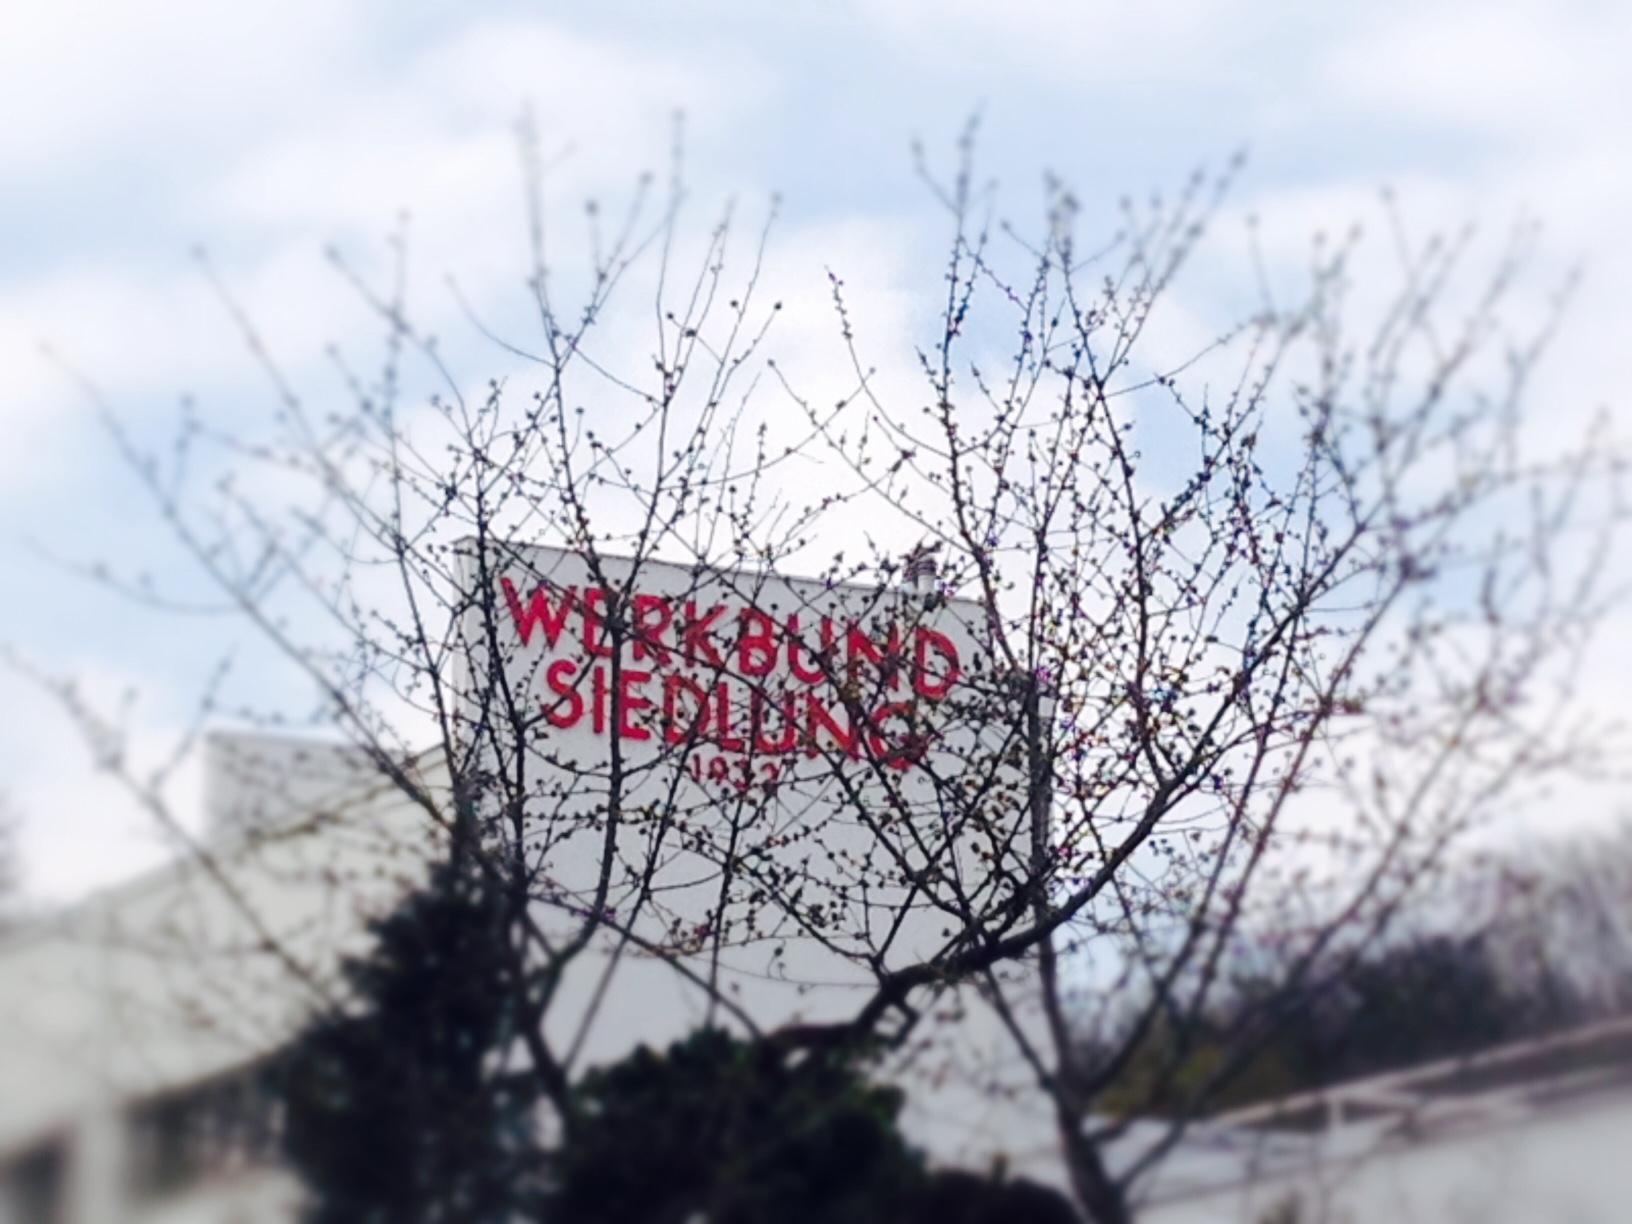 Werkbundsiedlung - kekinwien.at